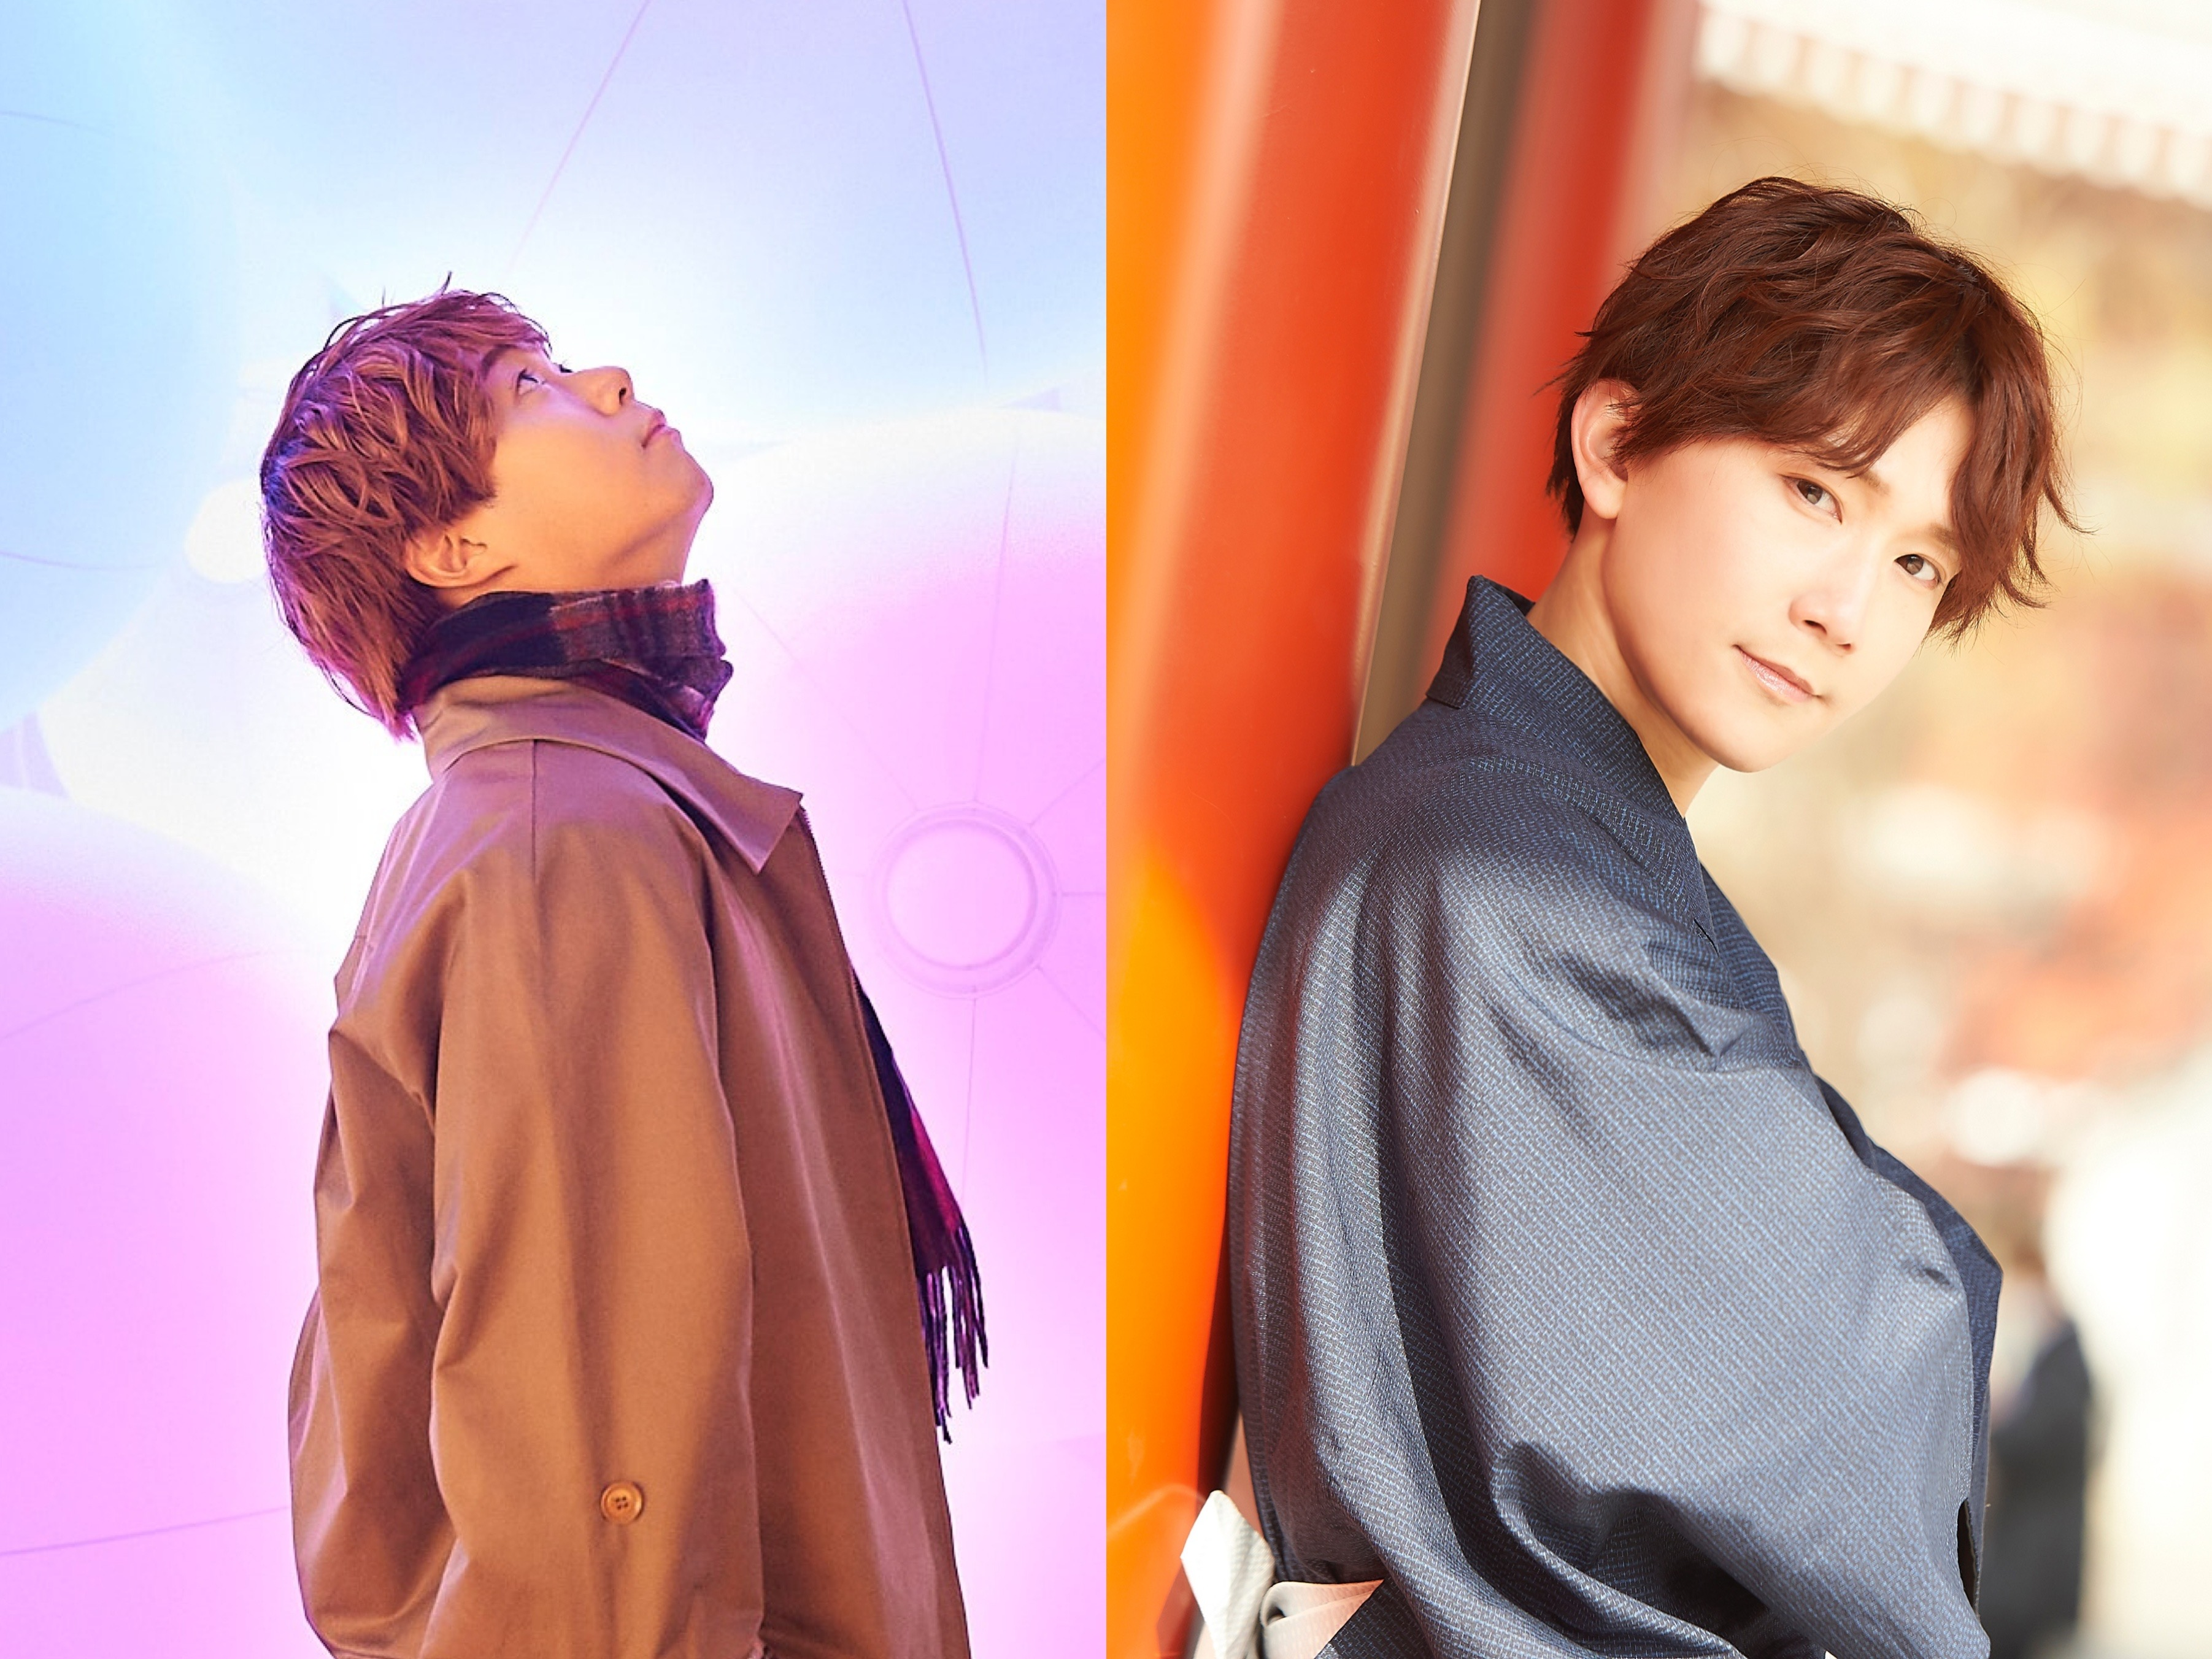 【NEWS】 優&春斗 オンライン生誕イベント 2daysで開催決定!